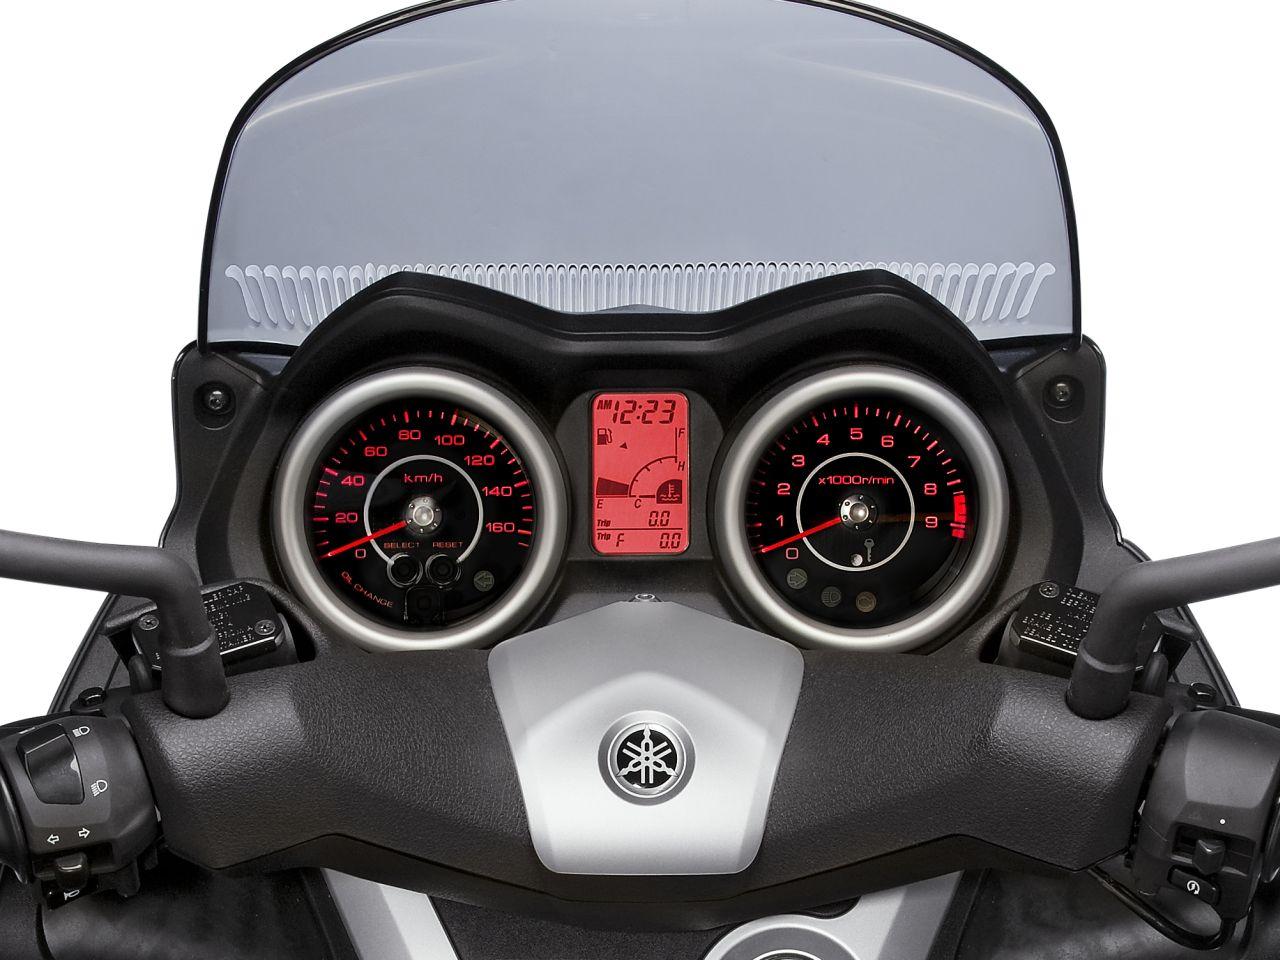 Yamaha News 2010: X MAX 250 und X MAX 125